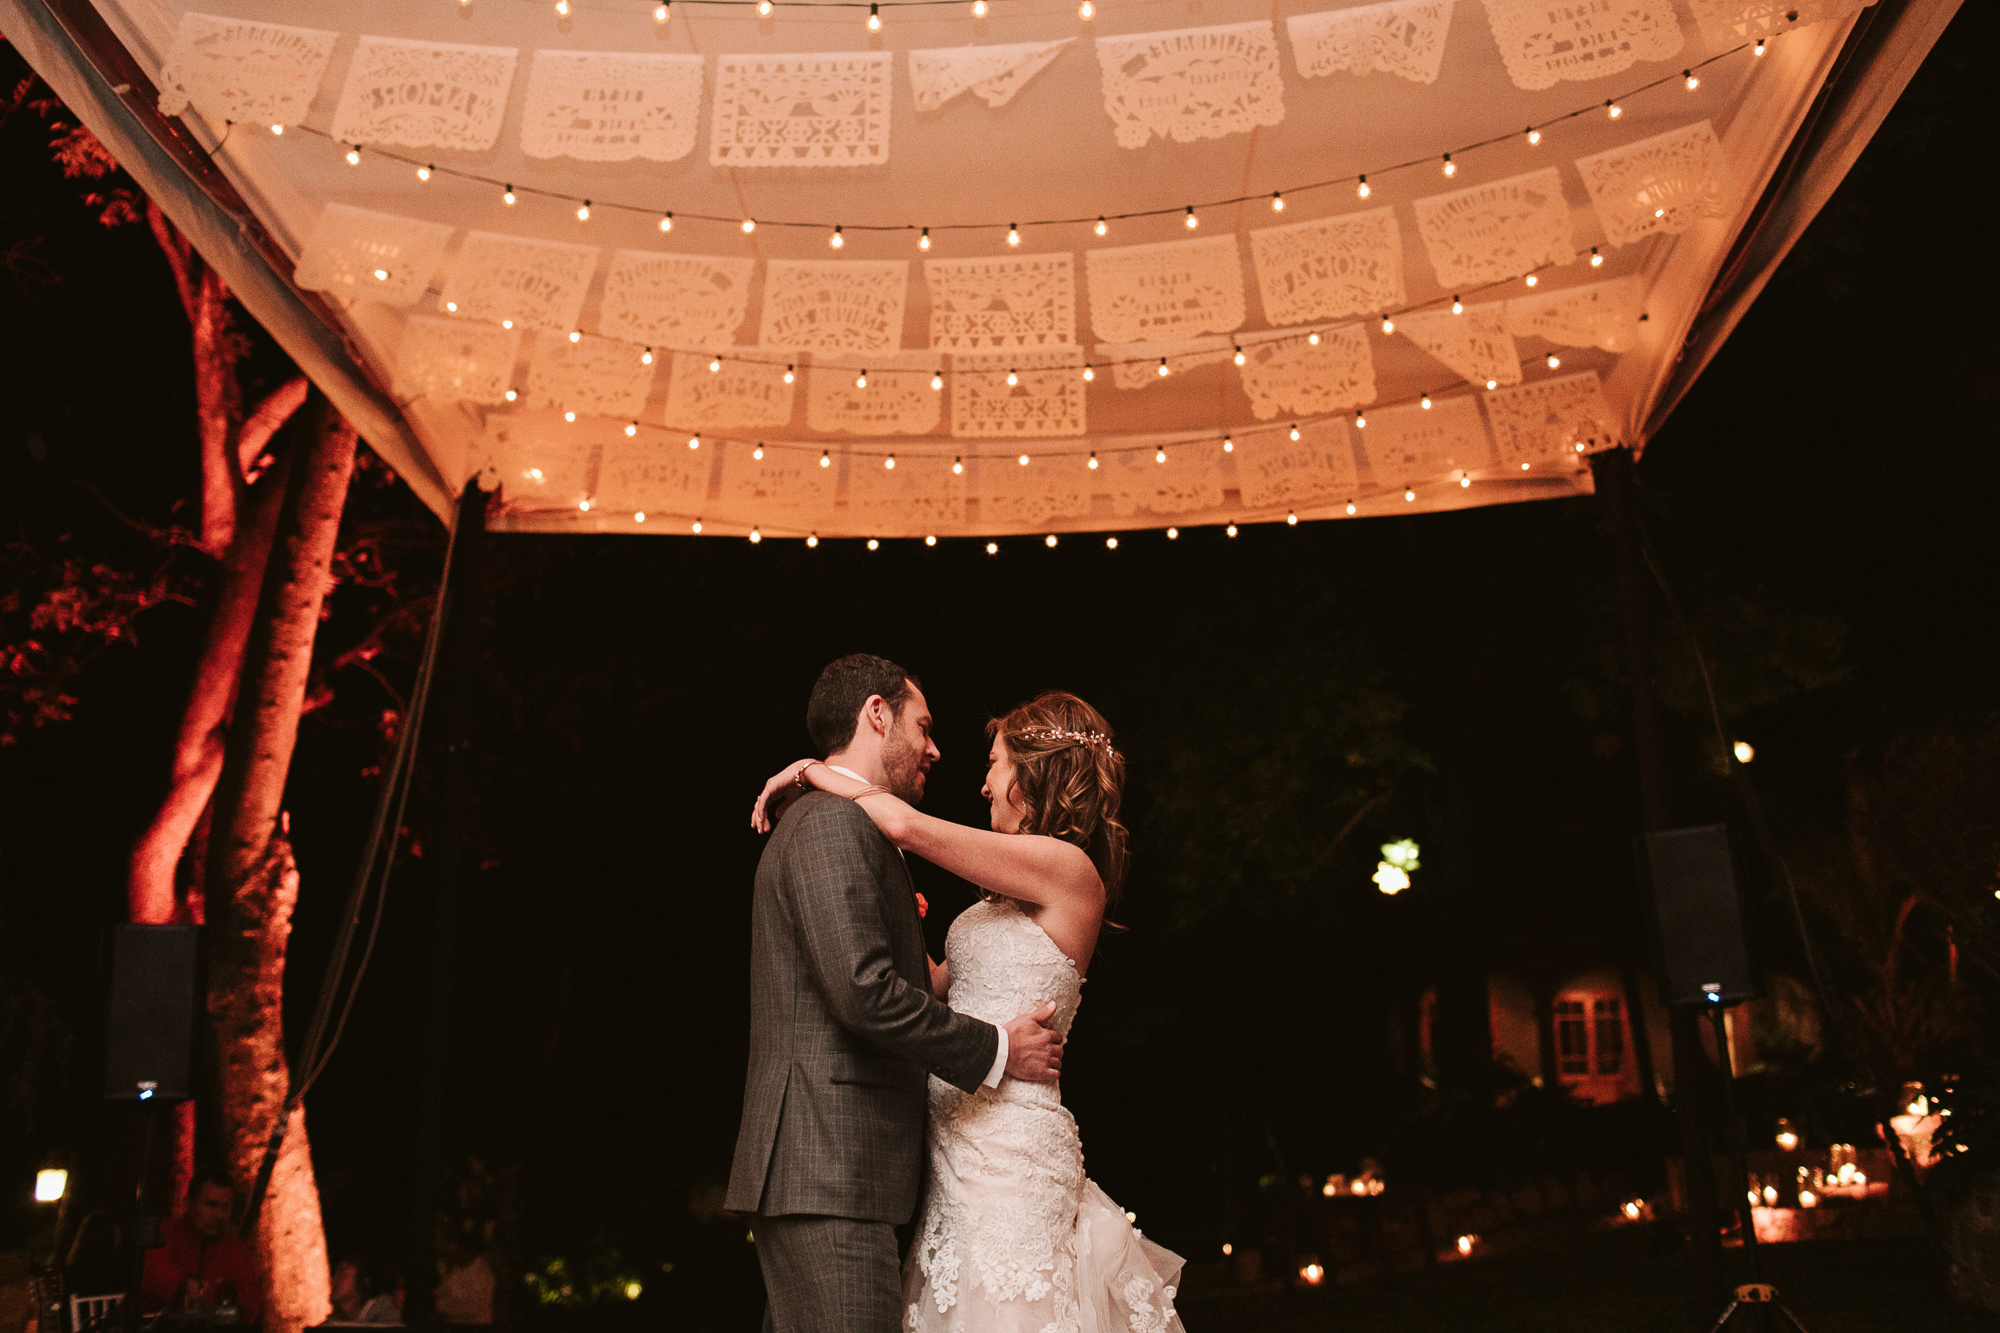 Destination-wedding-photographer-197.jpg